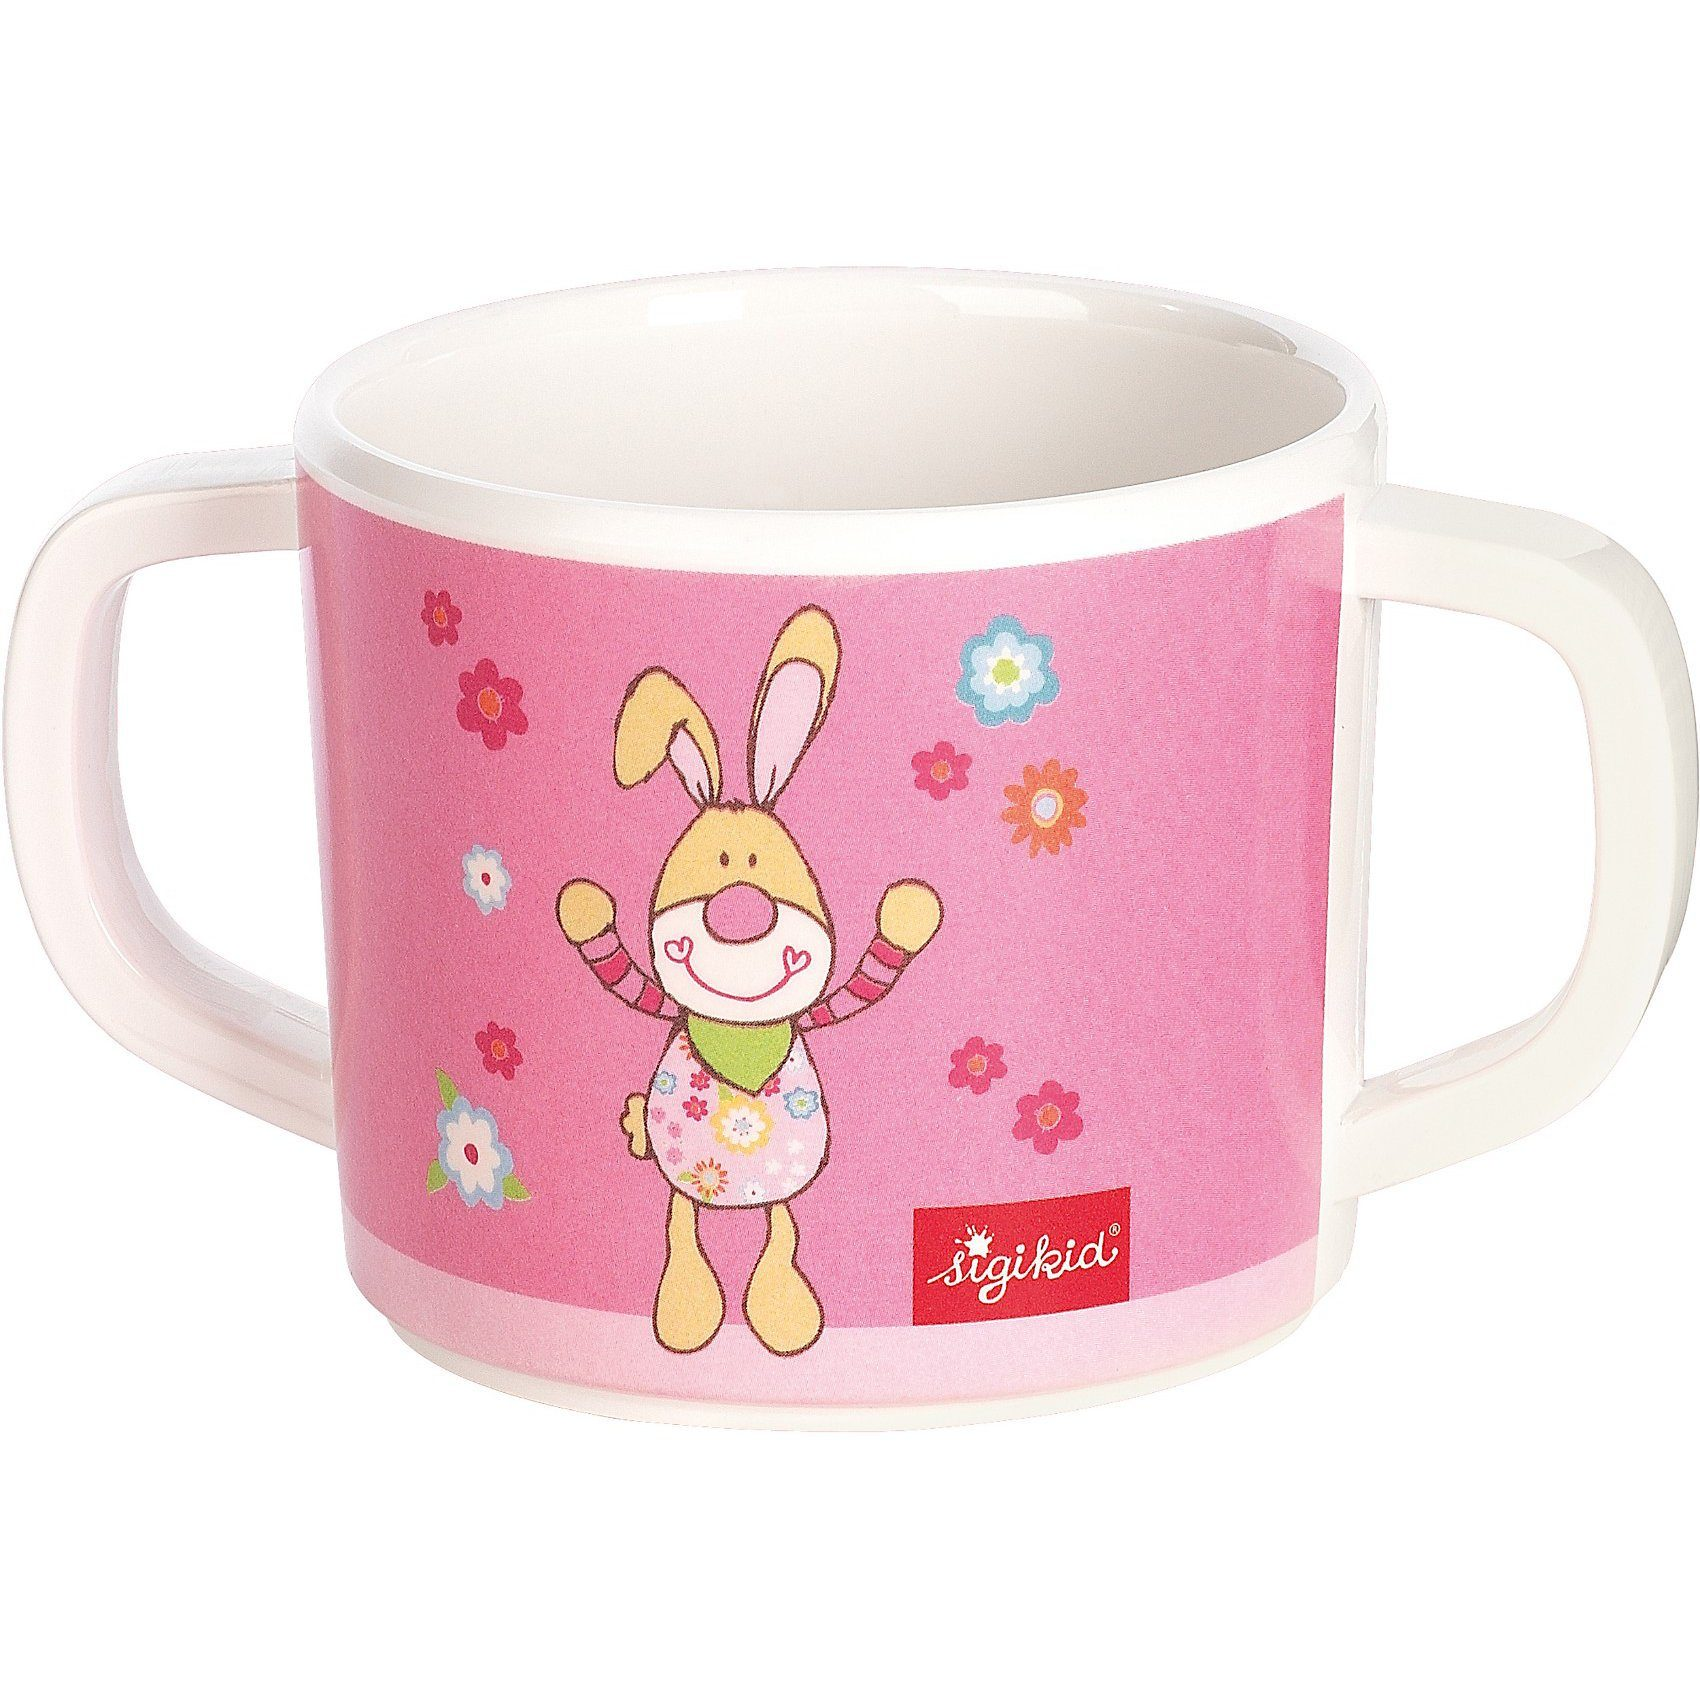 sigikid Melamin-Tasse Bungee Bunny (24434)